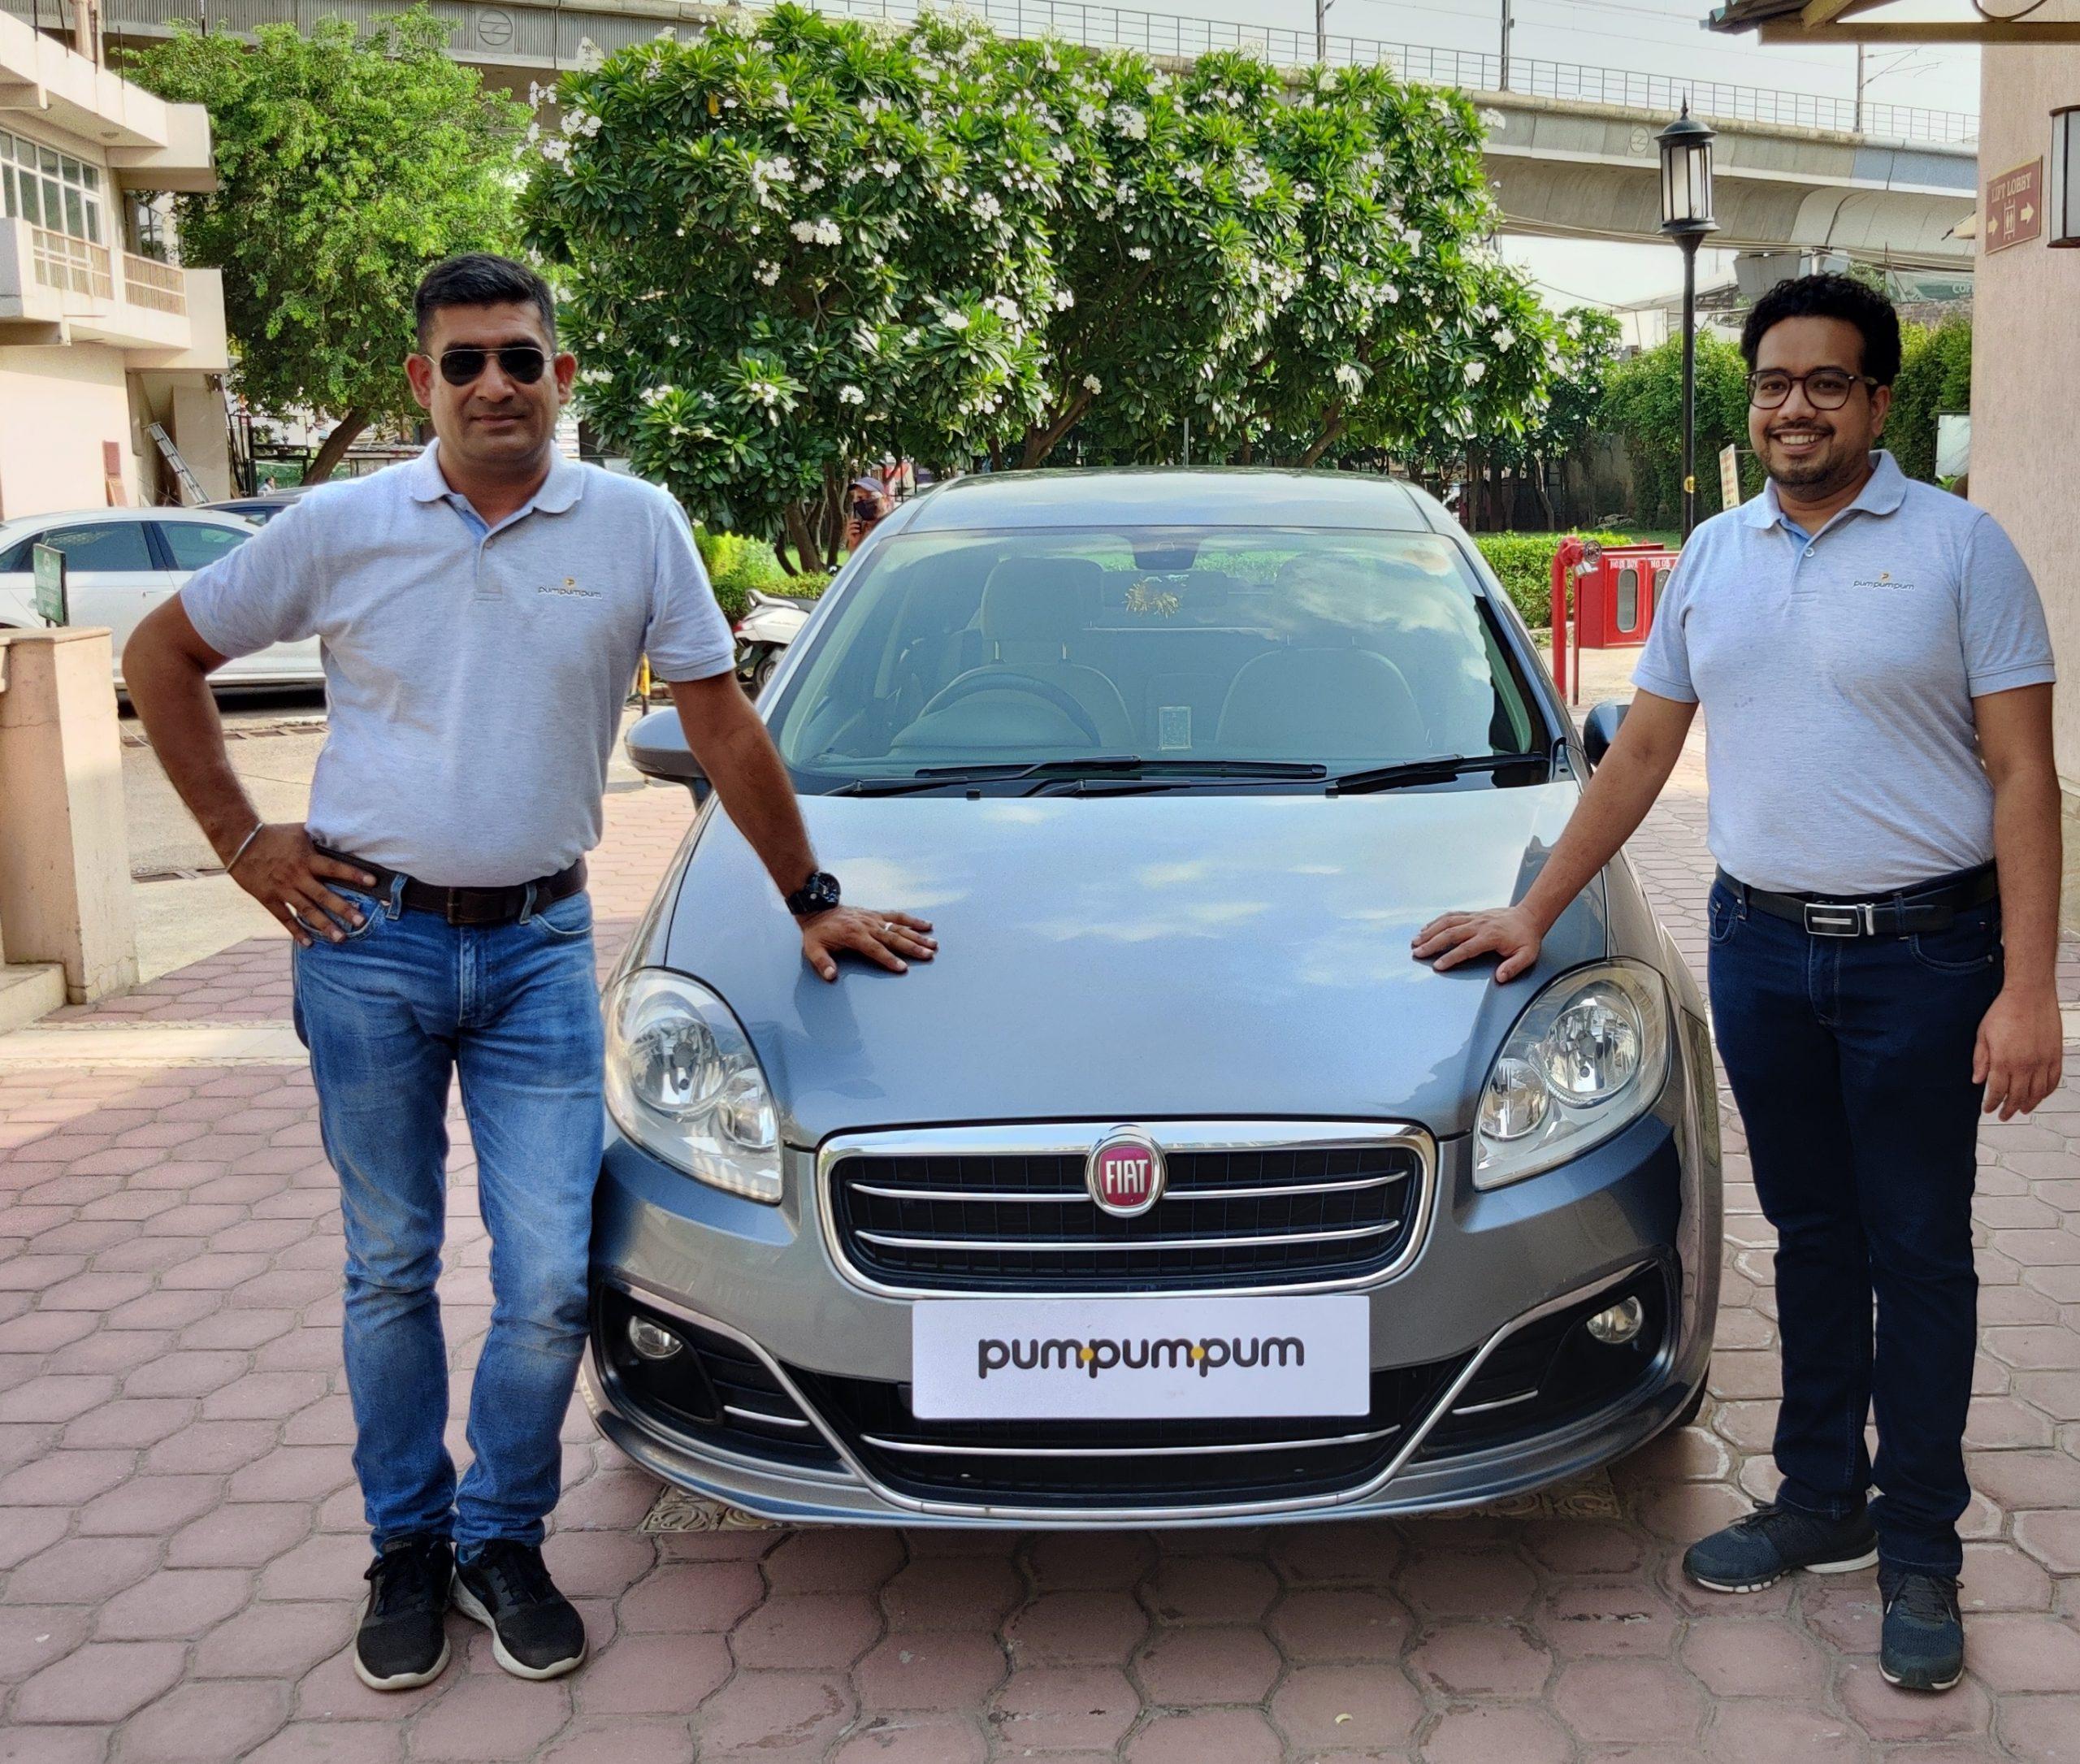 Car Leasing Startup PumPumPum Raised INR 5.5 Cr in Pre-Series A Funding by Inflection Point Ventures